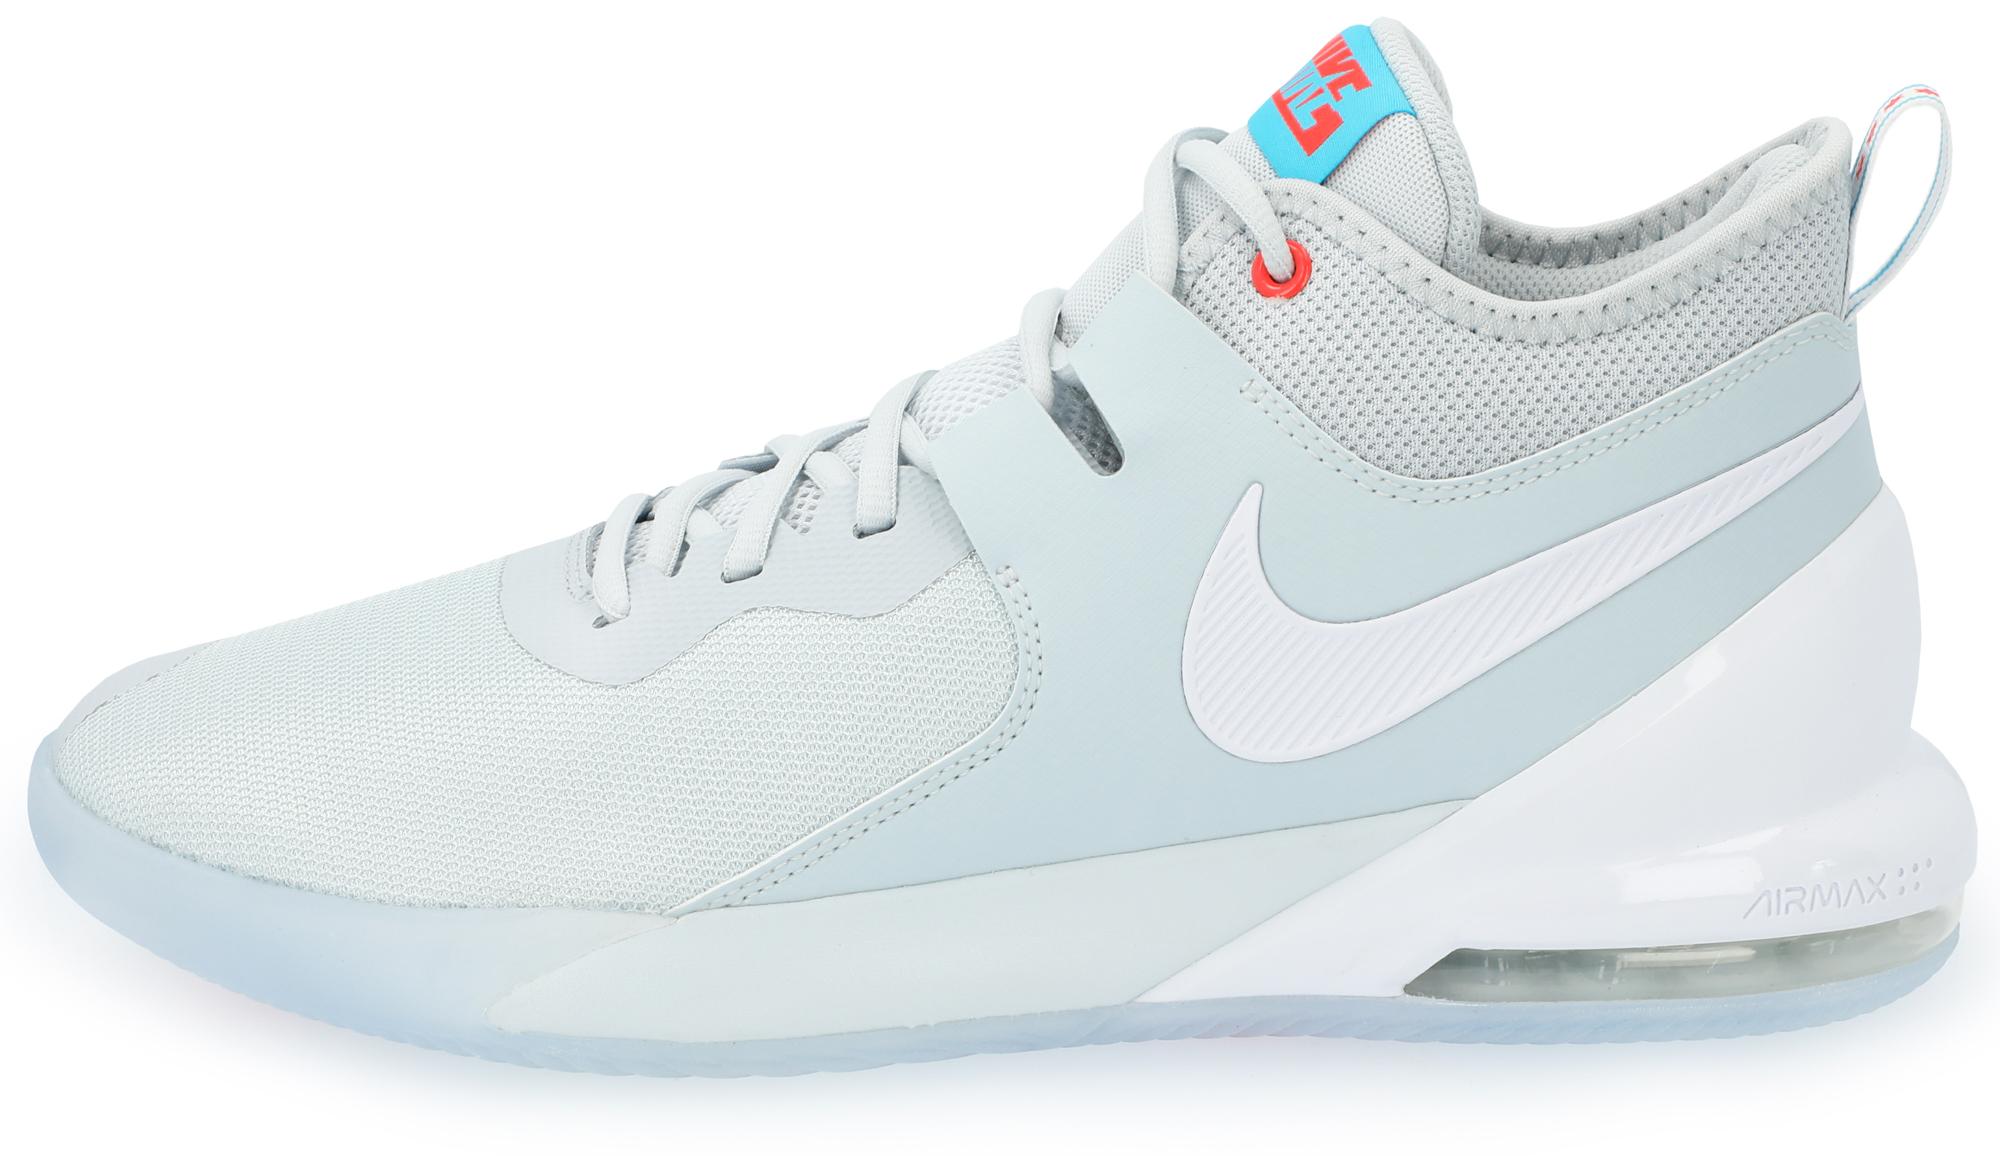 Nike Кроссовки мужские Nike Air Max Impact, размер 47.5